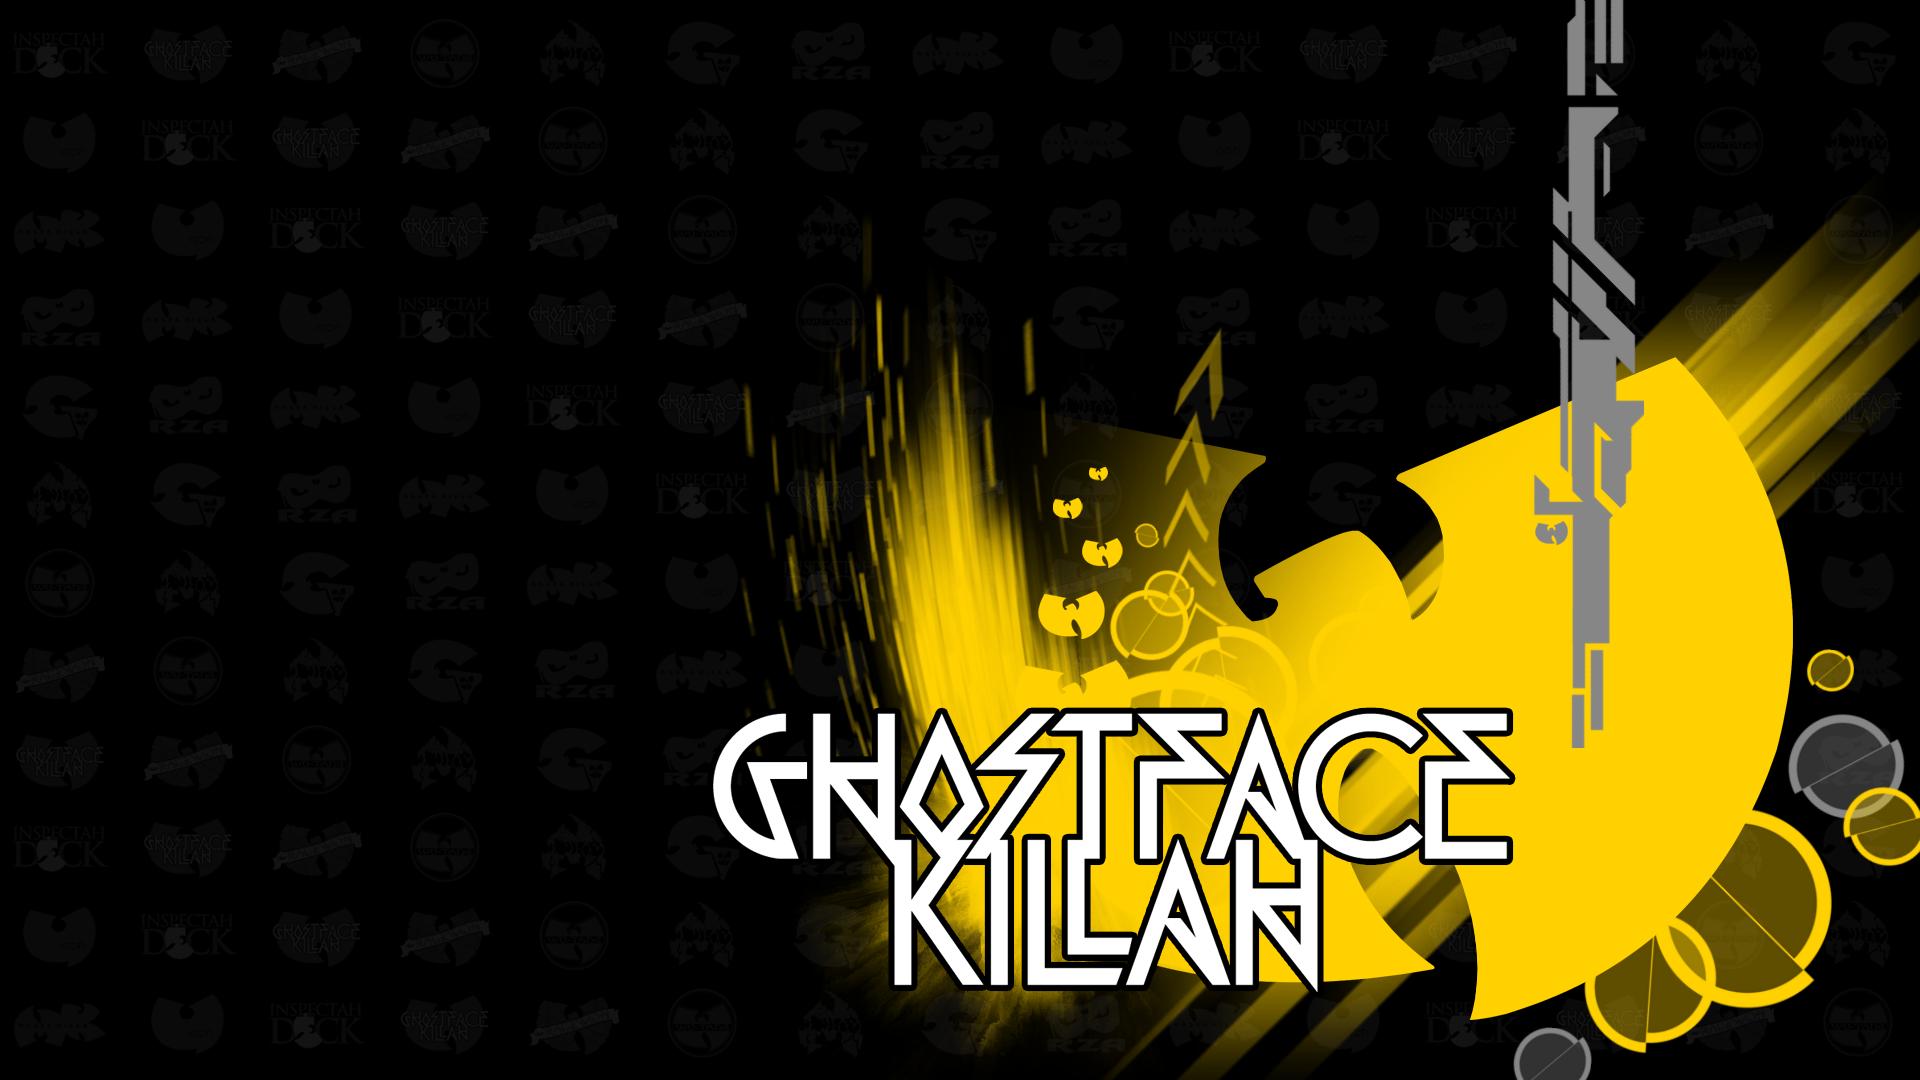 Wu-Tang Clan Logos: Ghostface Killah